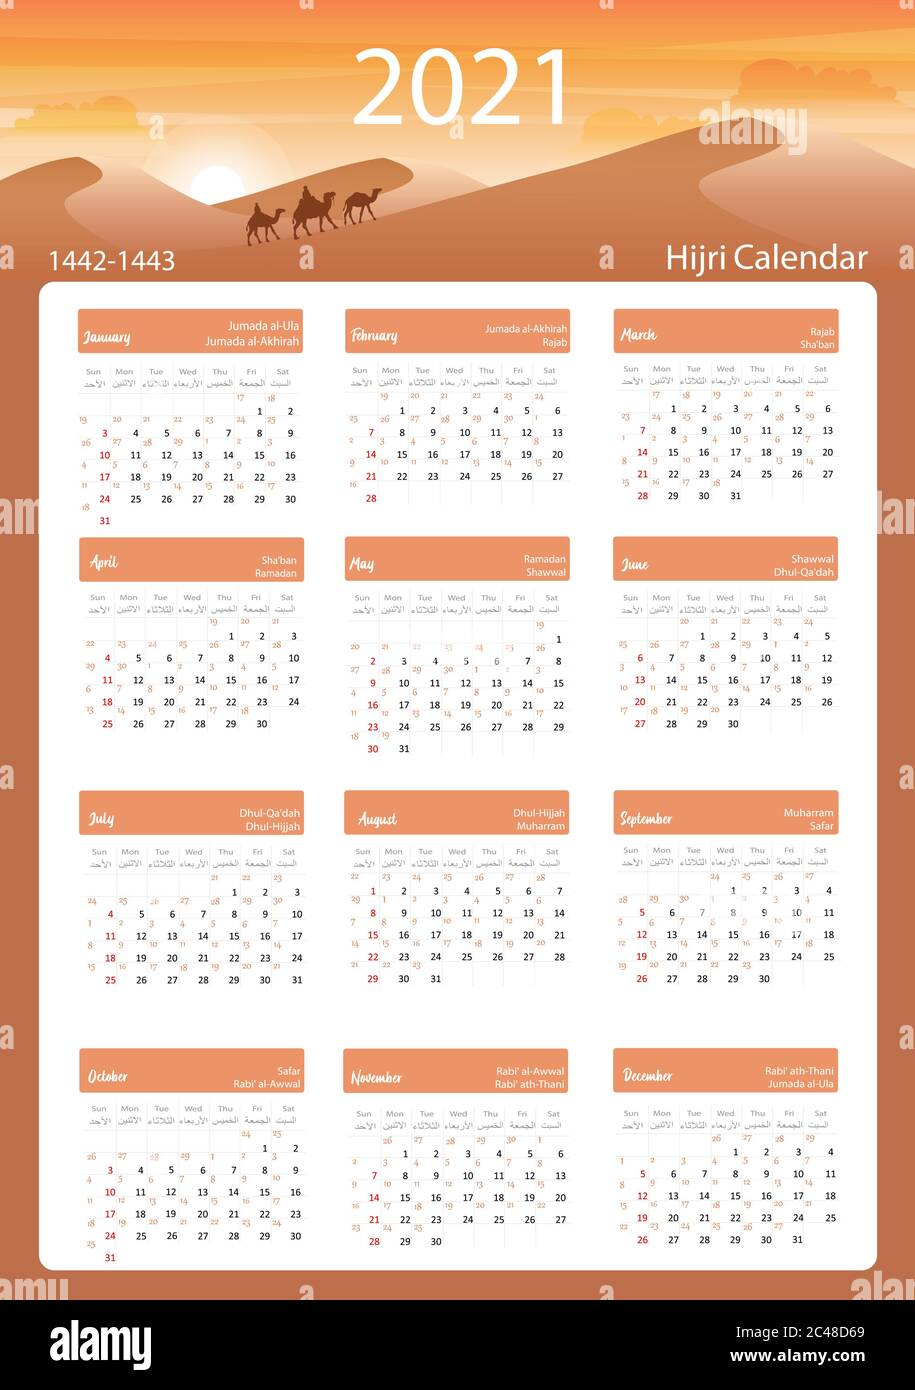 Calendario Islamico Immagini e Fotos Stock   Alamy